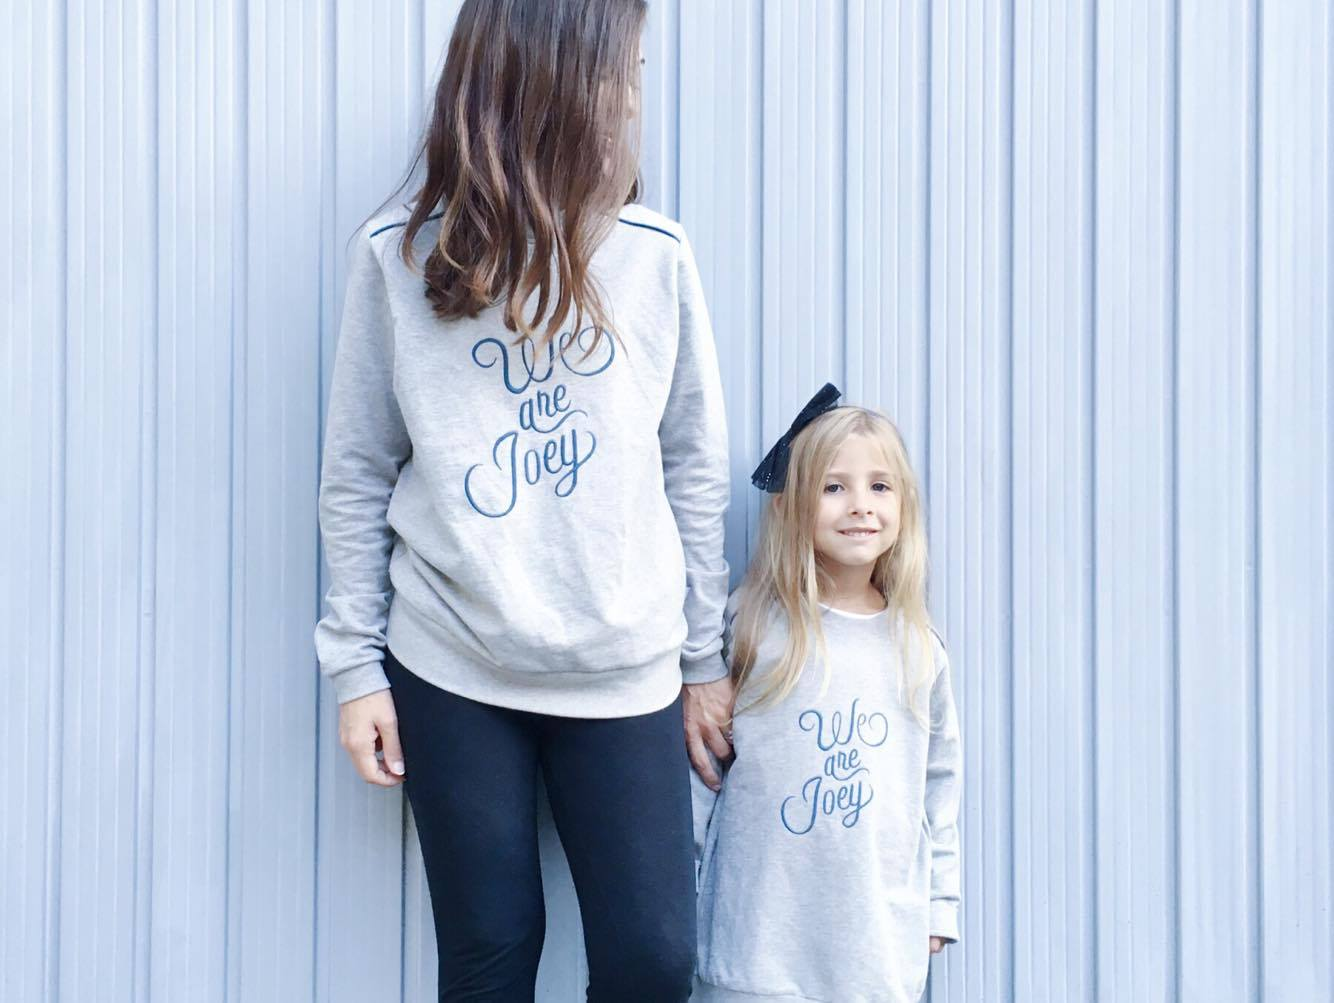 Io, lei, un sweatshirt: WE ARE JOEY